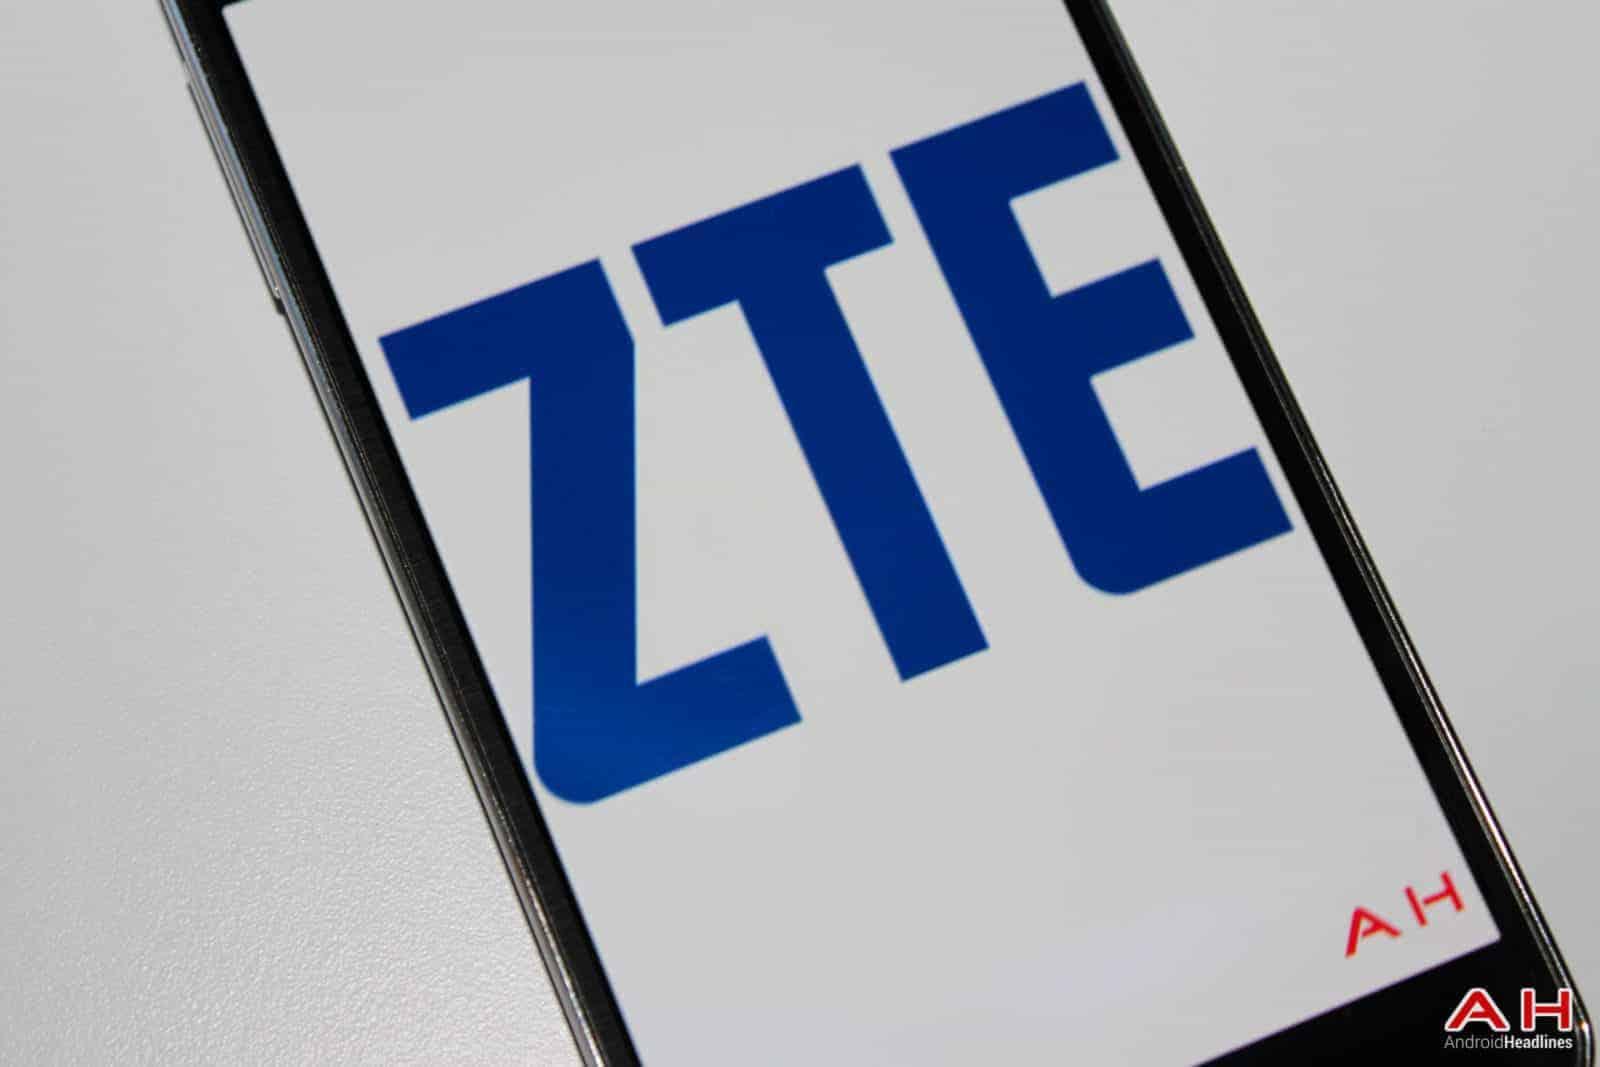 AH ZTE Logo 1.2